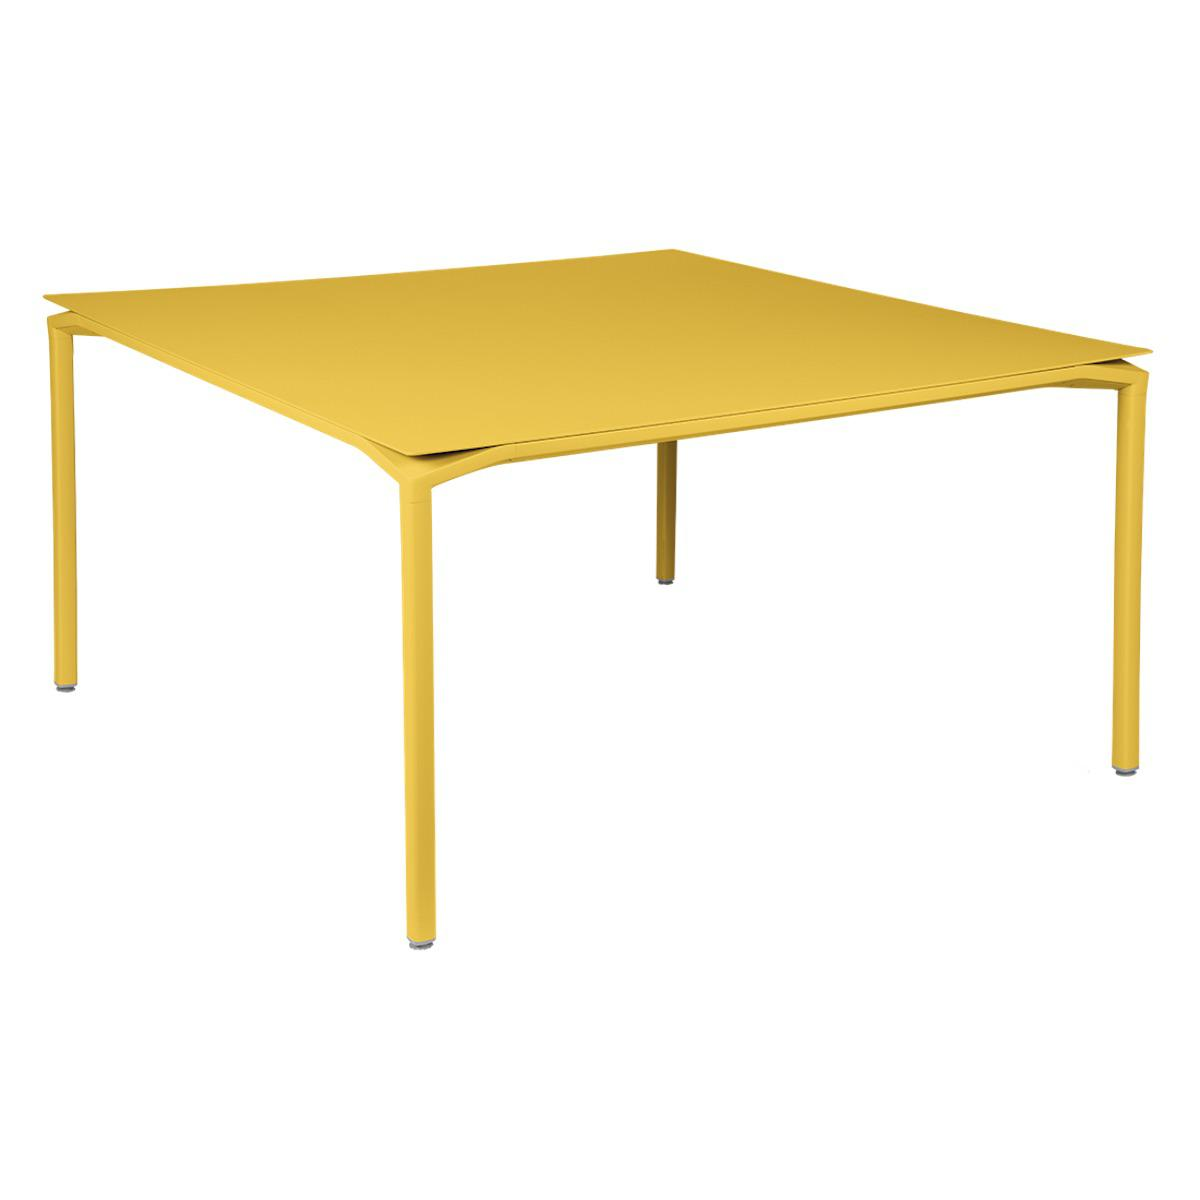 Table 140x140cm CALVI Fermob jaune miel